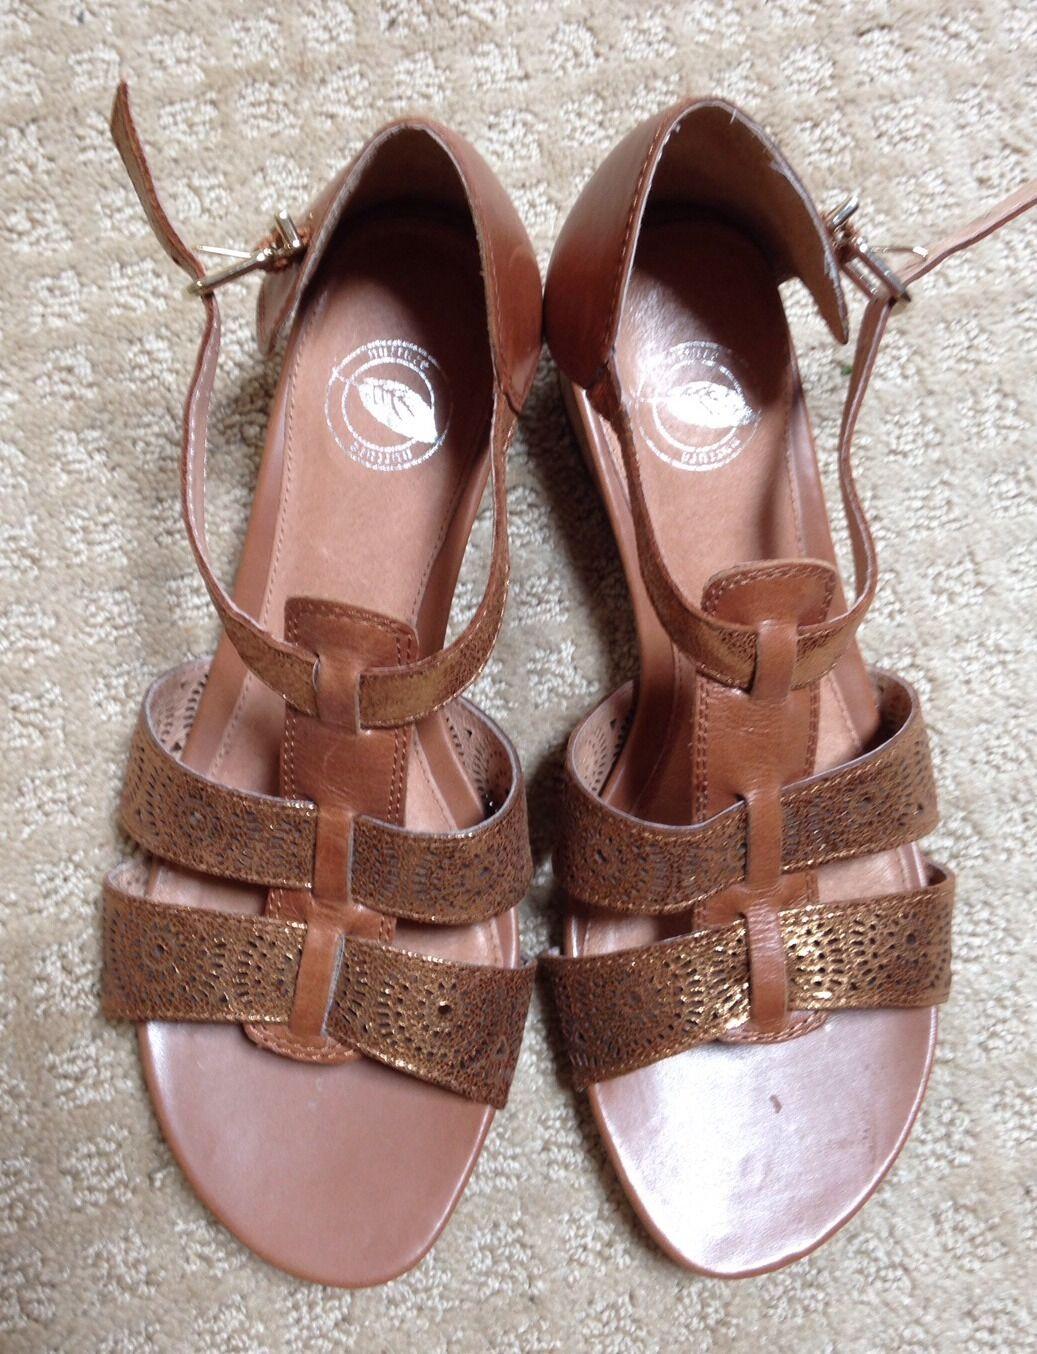 EUC Women's Nuture Brown and Metallic $80 Strap Wedge Sandal Retail $80 Metallic e5f8ed